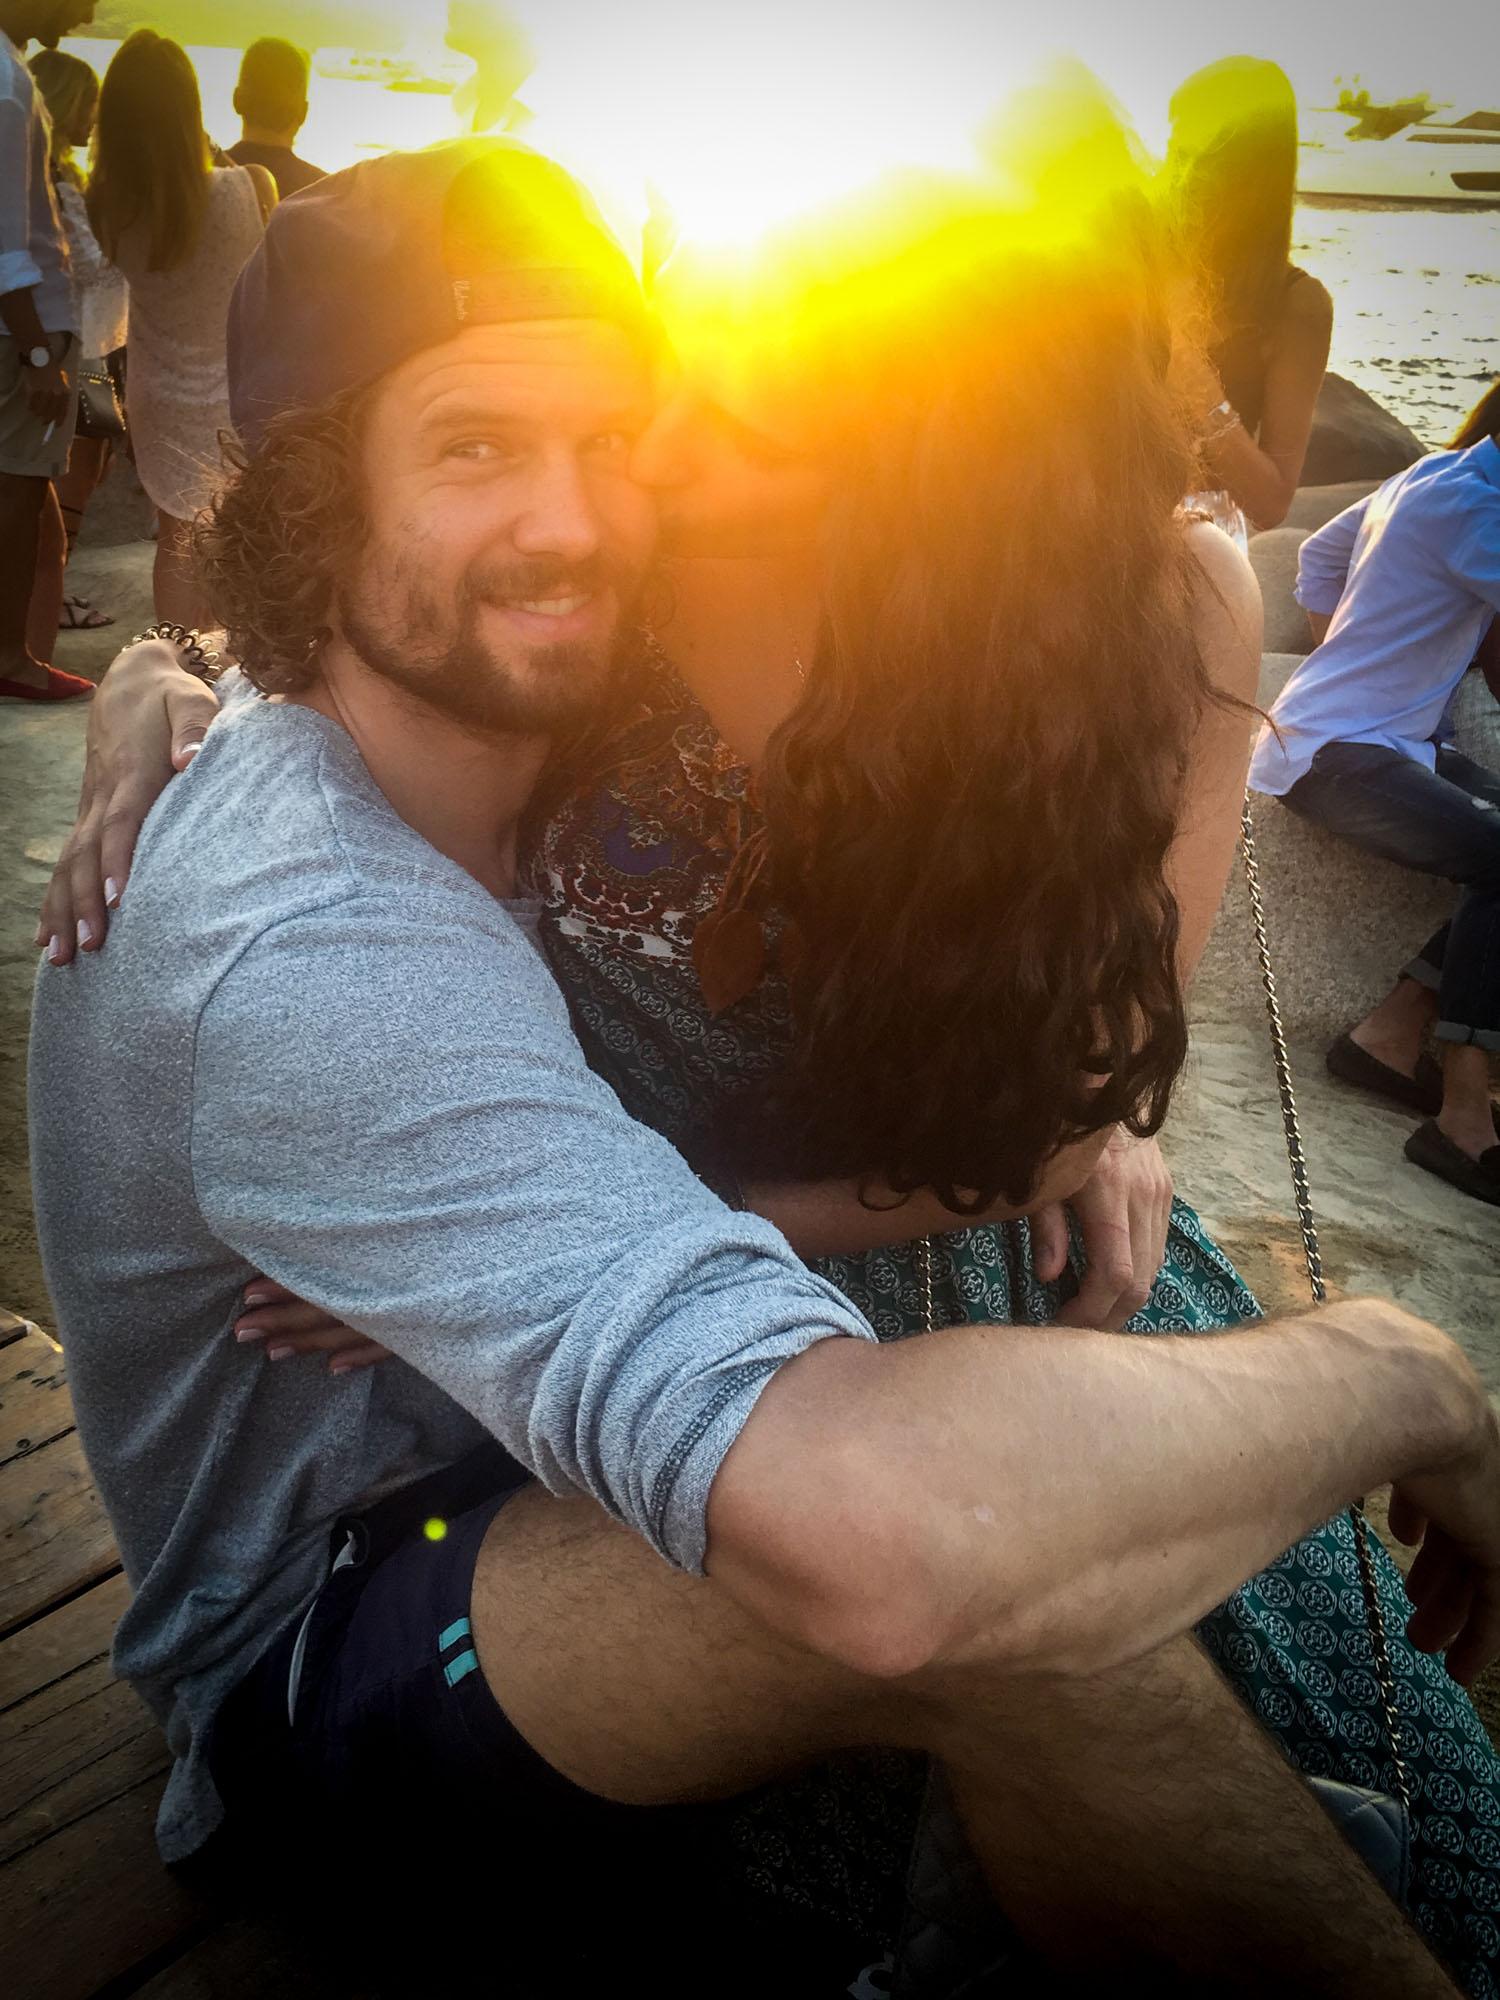 Babe and i phi beach1